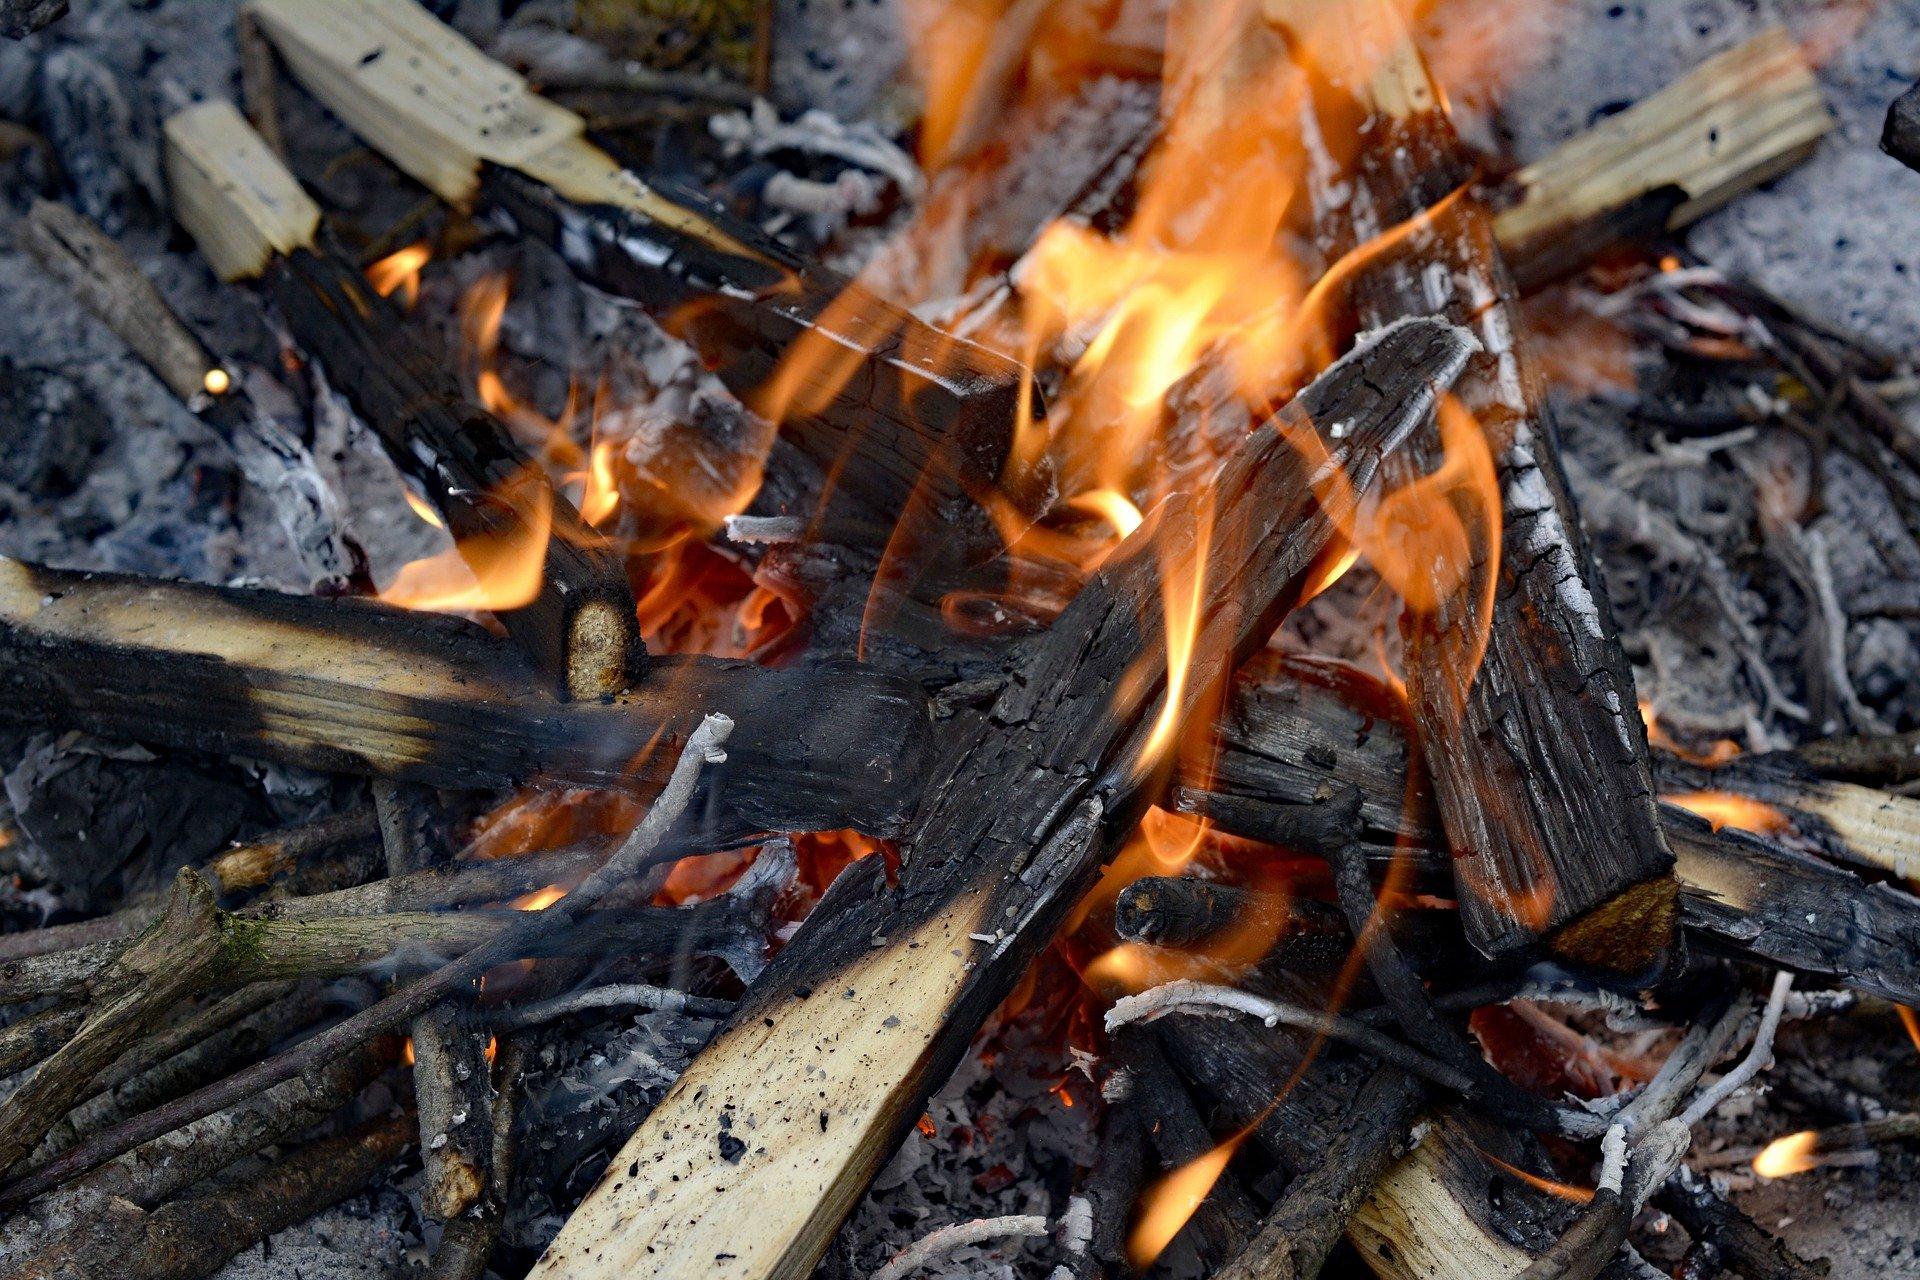 Wild Black Cherry Wood For Smoking